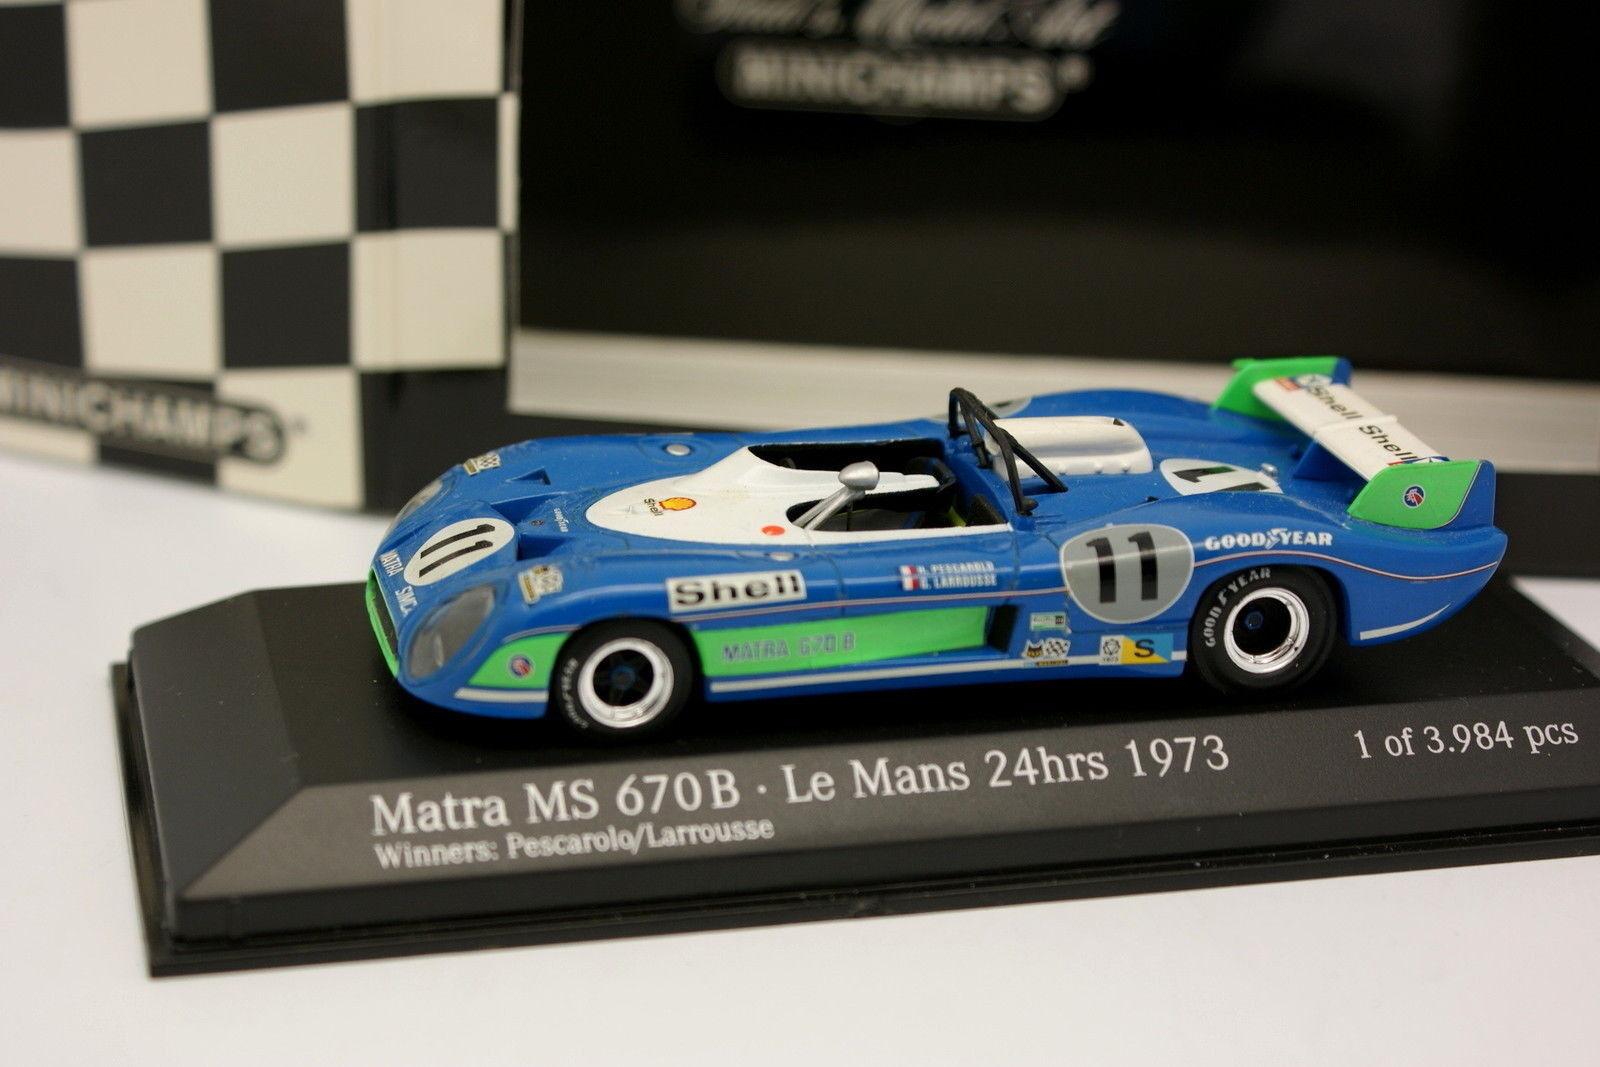 Minichamps 1 43 - Matra Simca MS670B Le Mans 1973 n°11